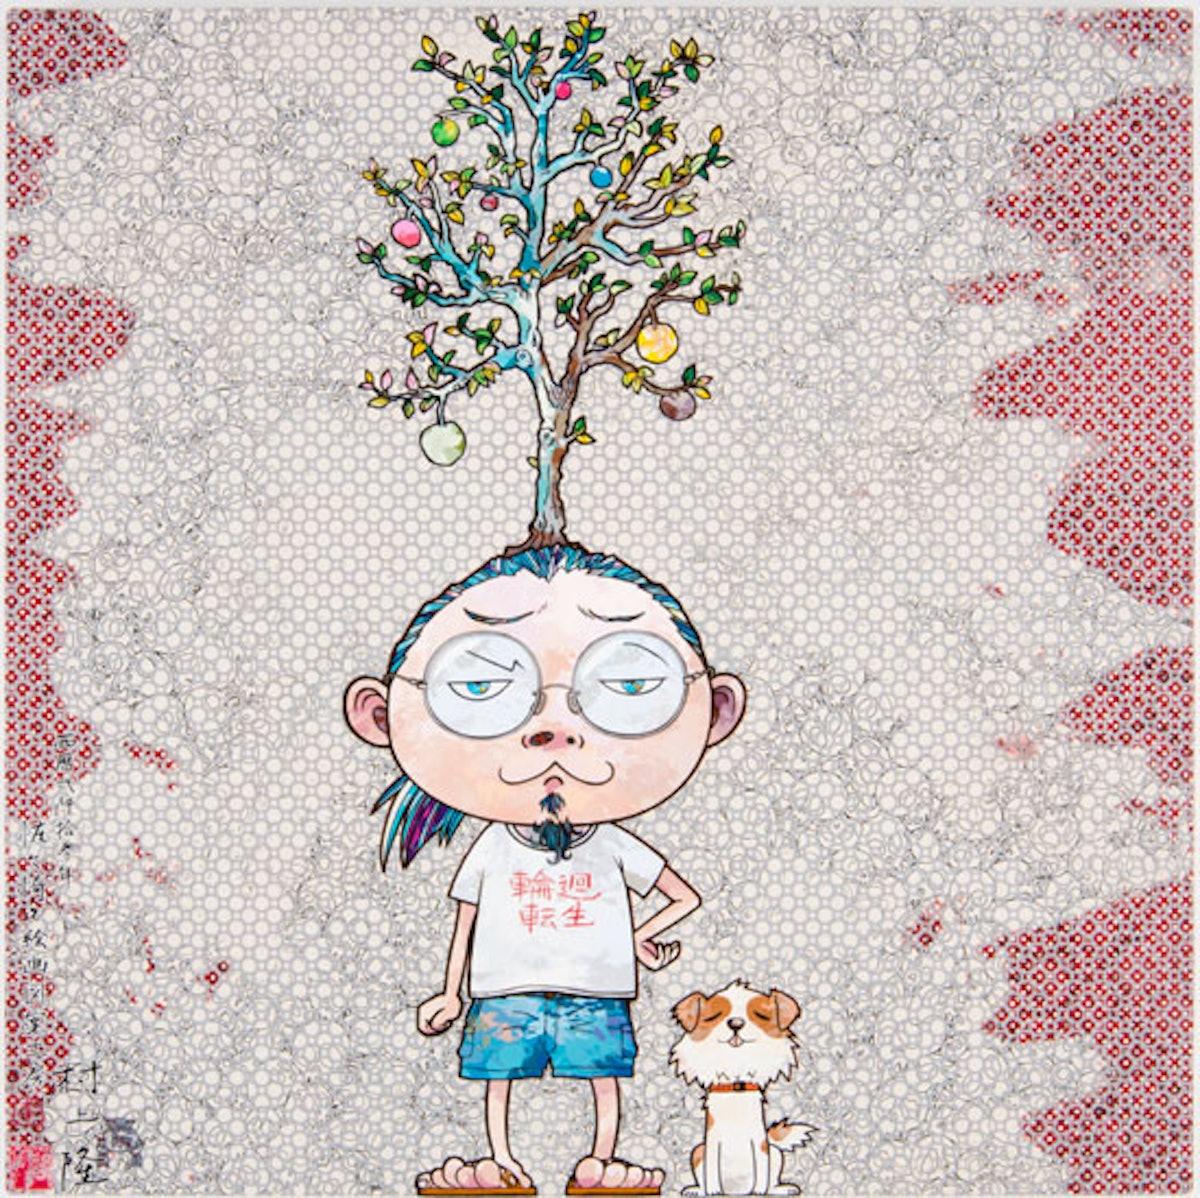 blog-takashi-murakami-sprouting-a-tree.jpg